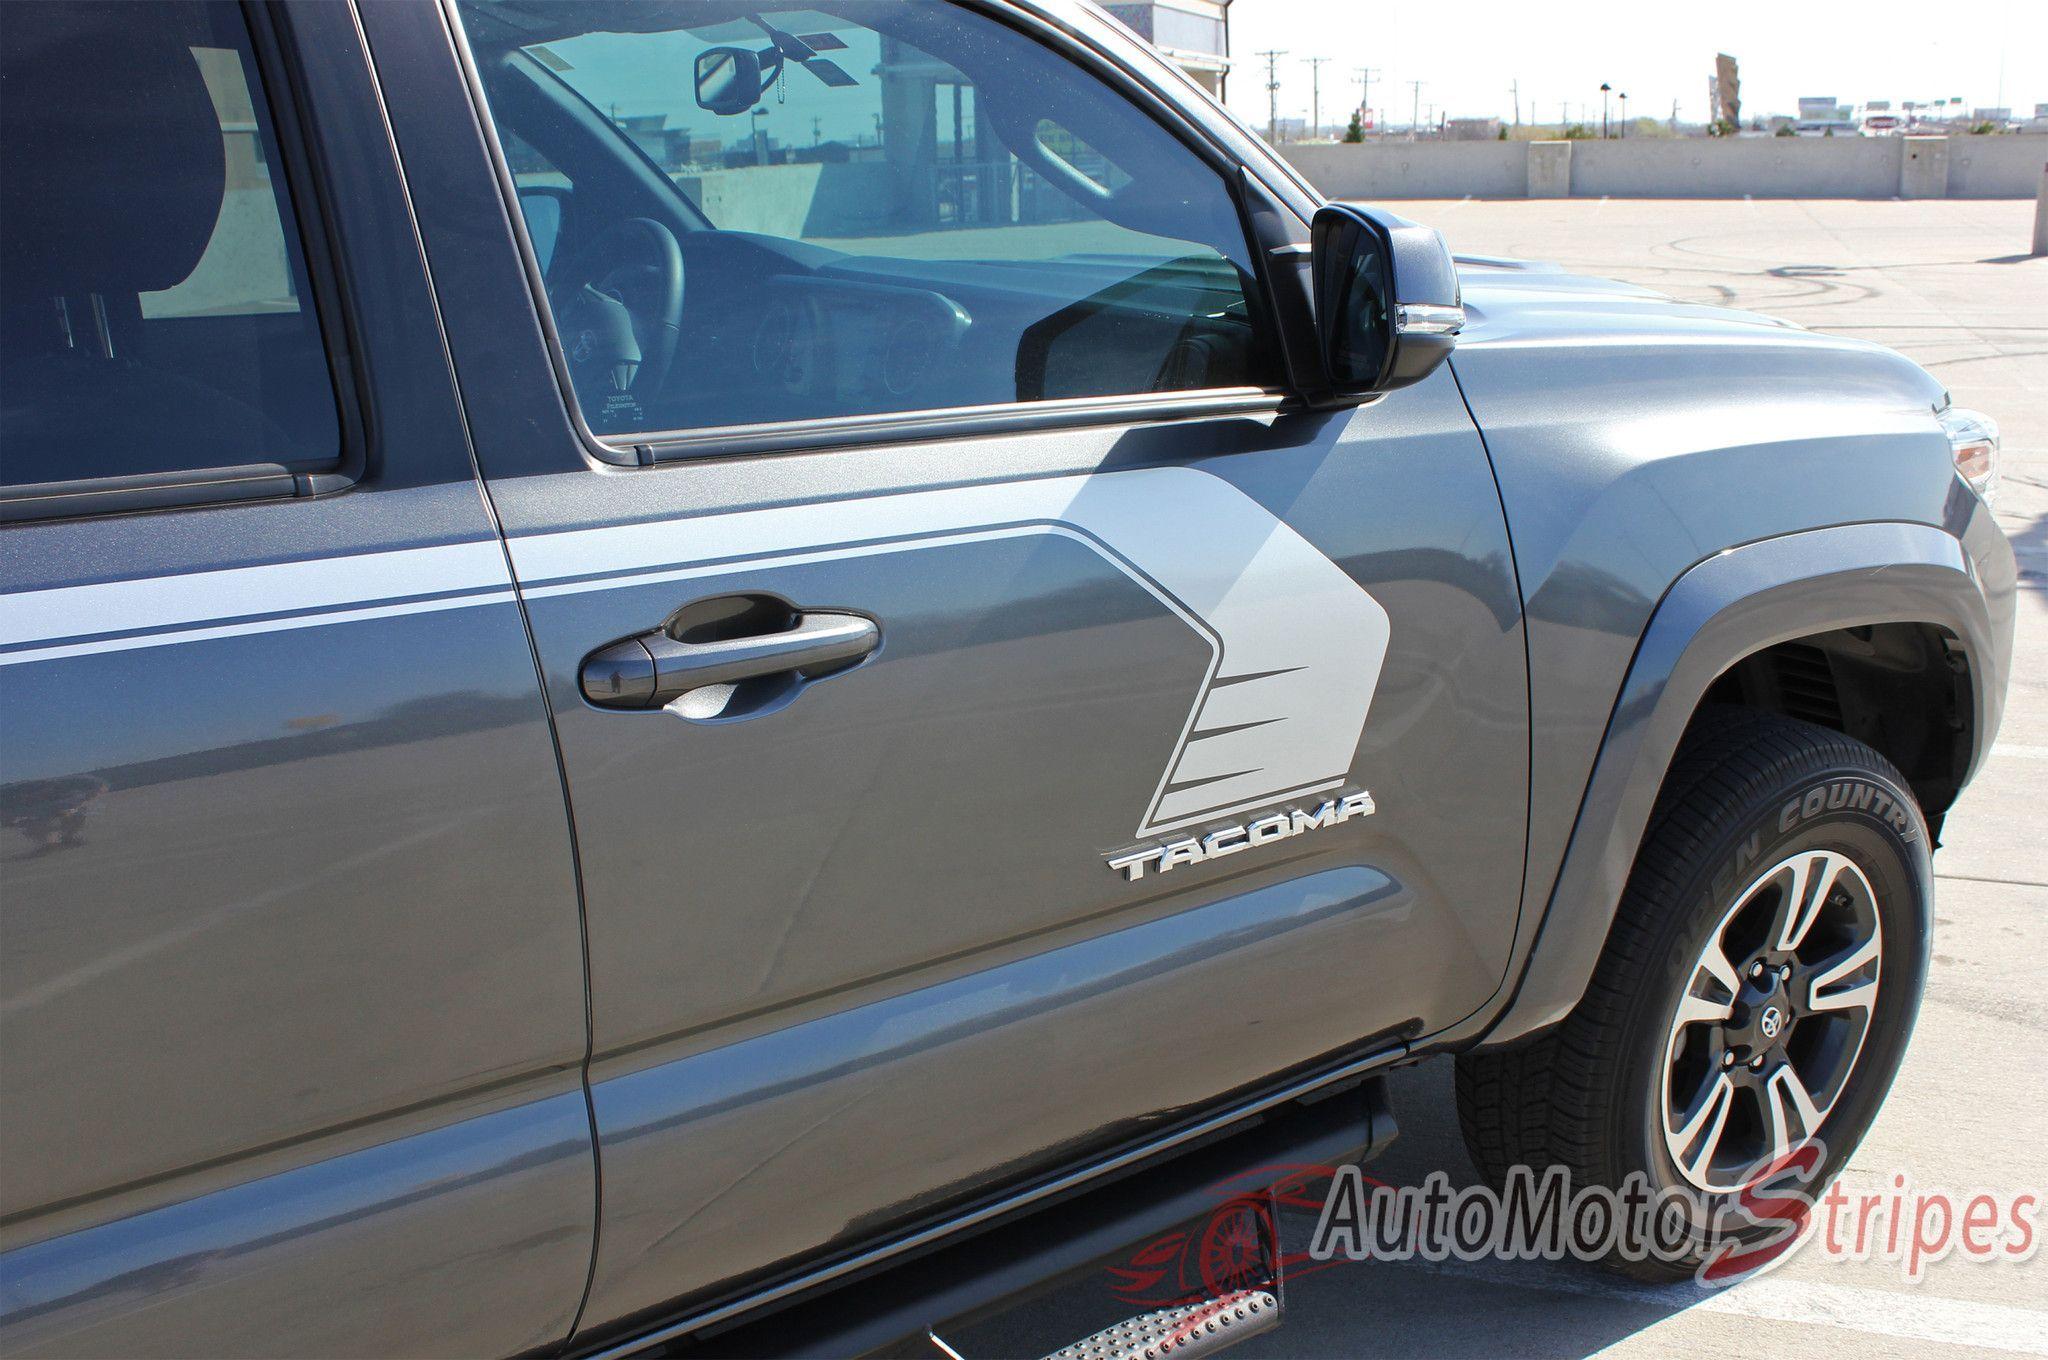 Toyota Tacoma Storm Upper Door Panel Accent Trim - Decal graphics inc